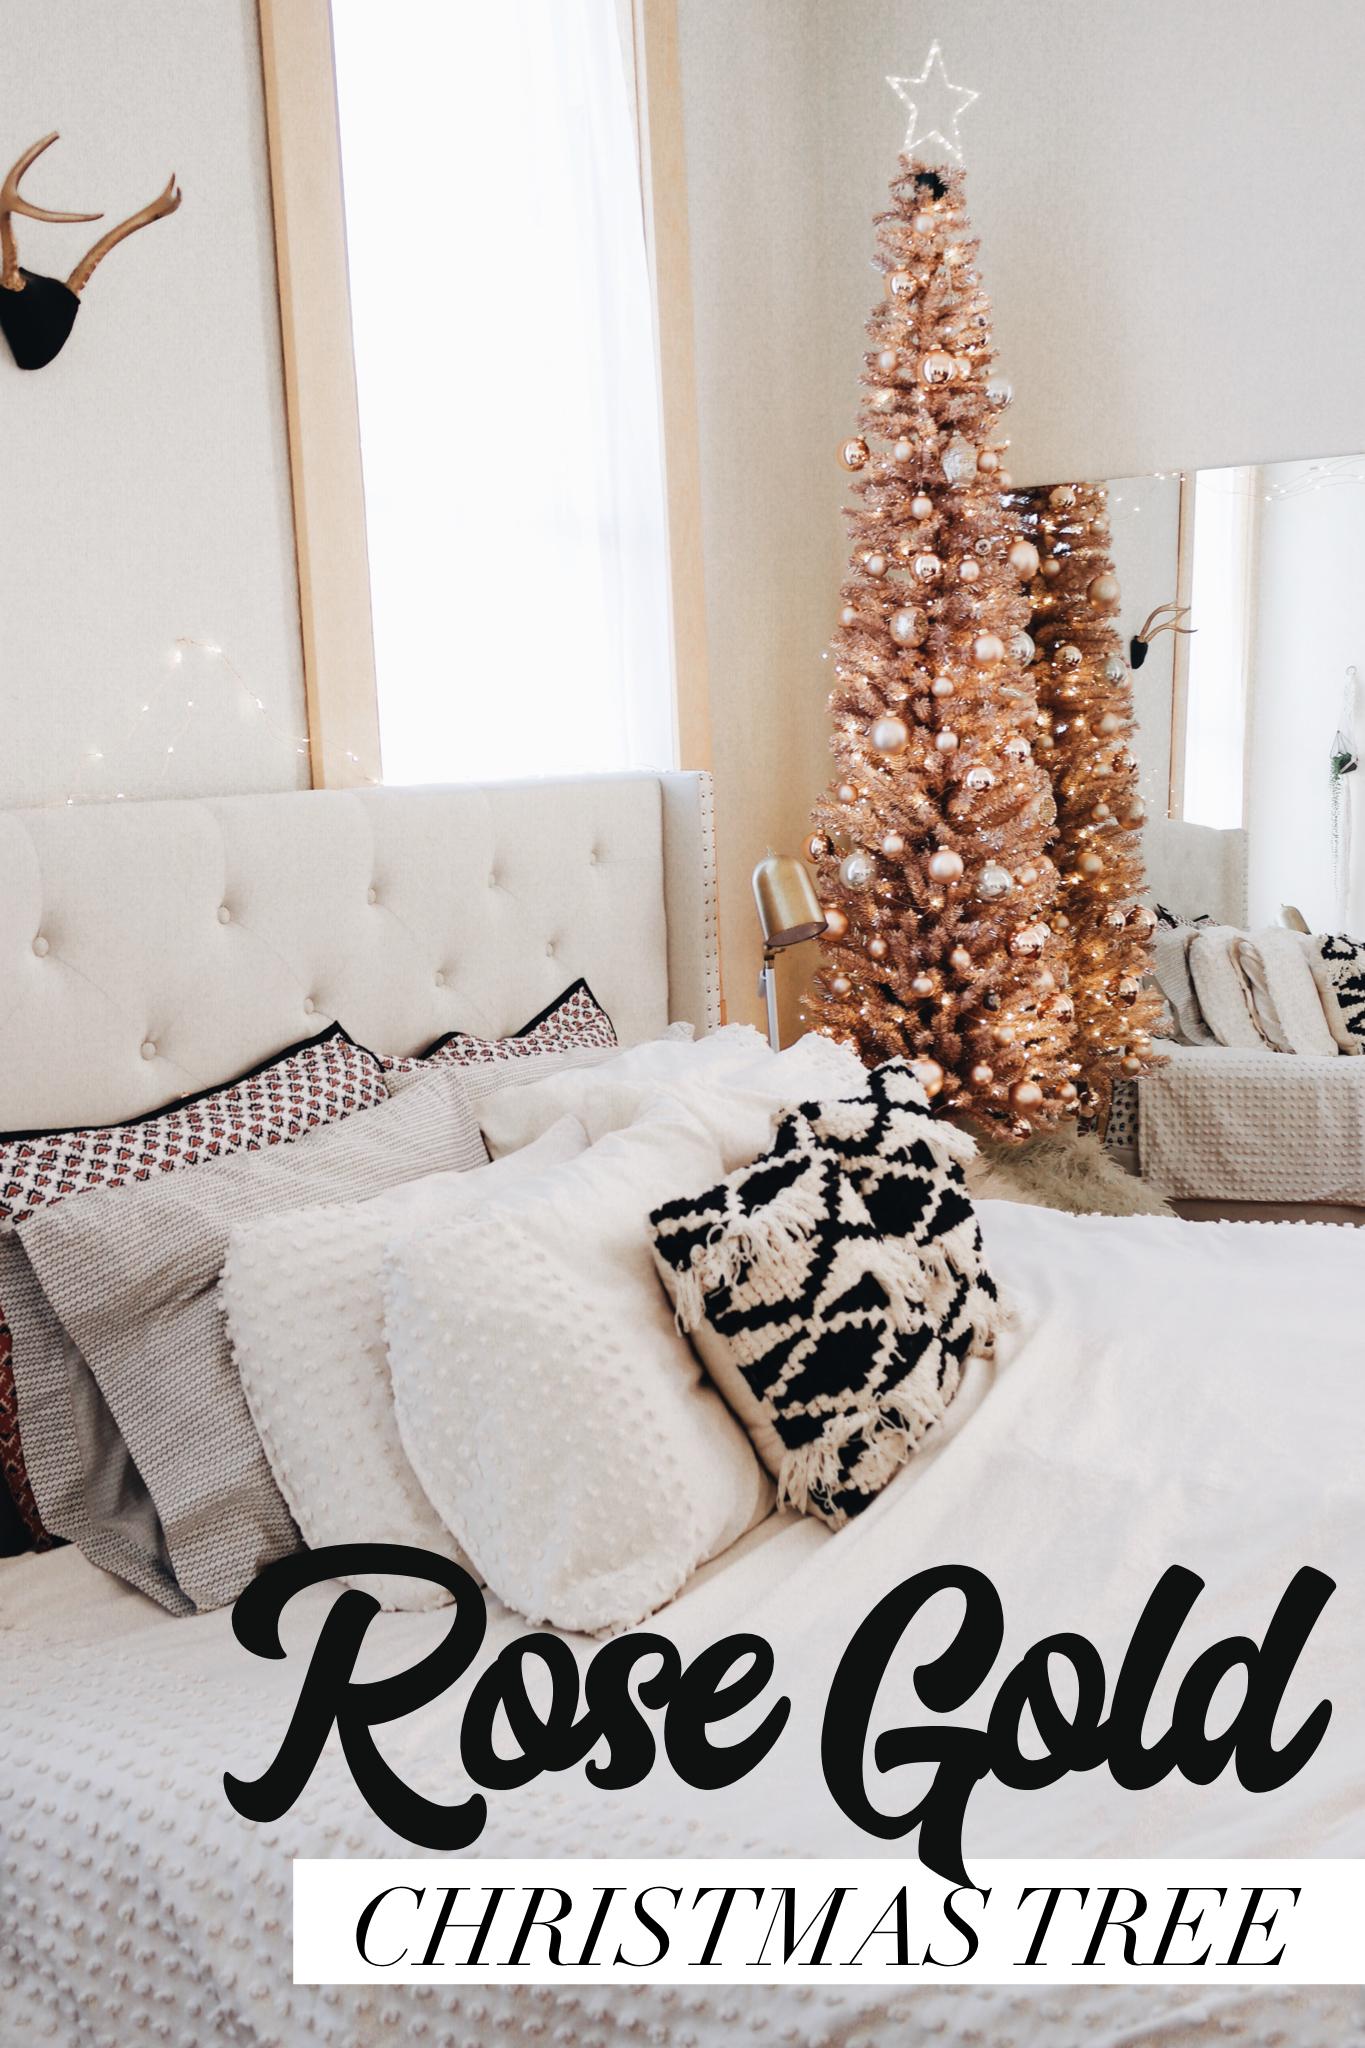 Rose Gold Christmas Tree Samantha Hauger